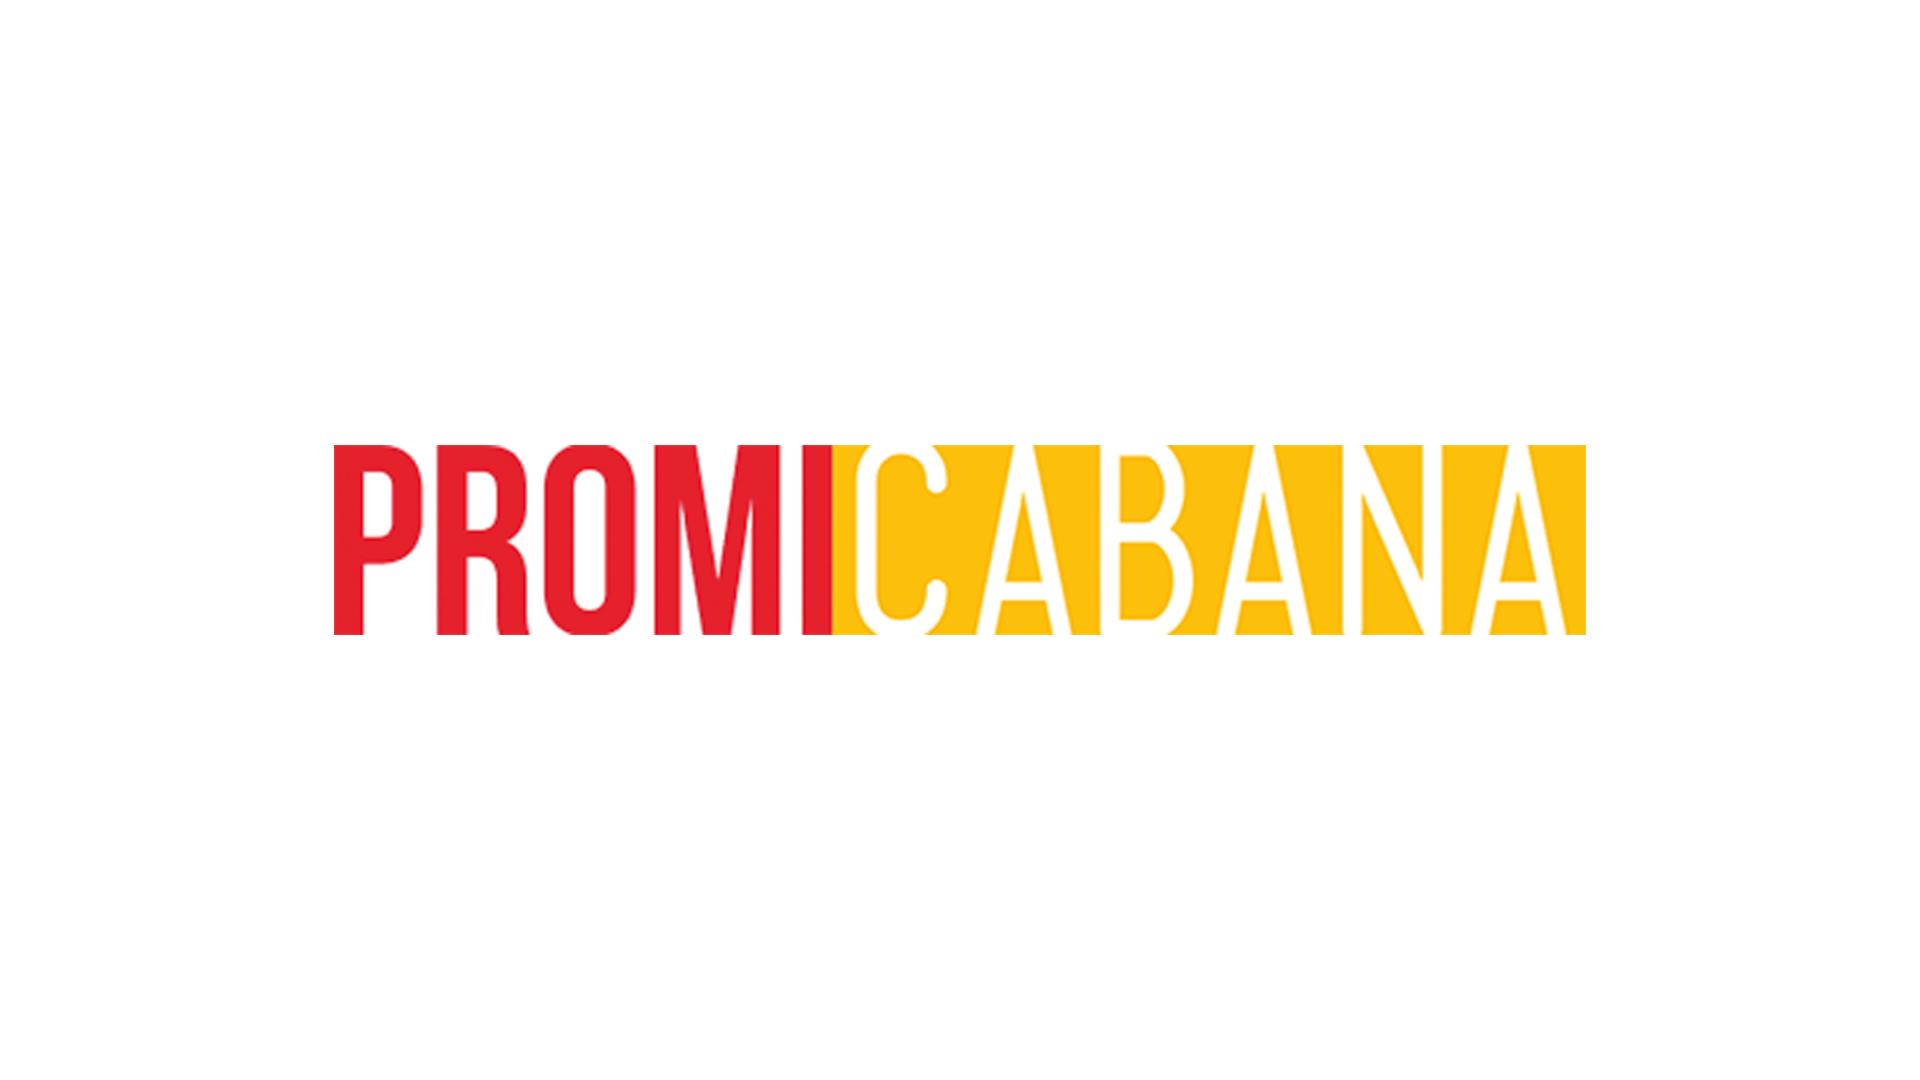 Tom Cruise Erster Die Mumie Teaser Trailer Promicabana